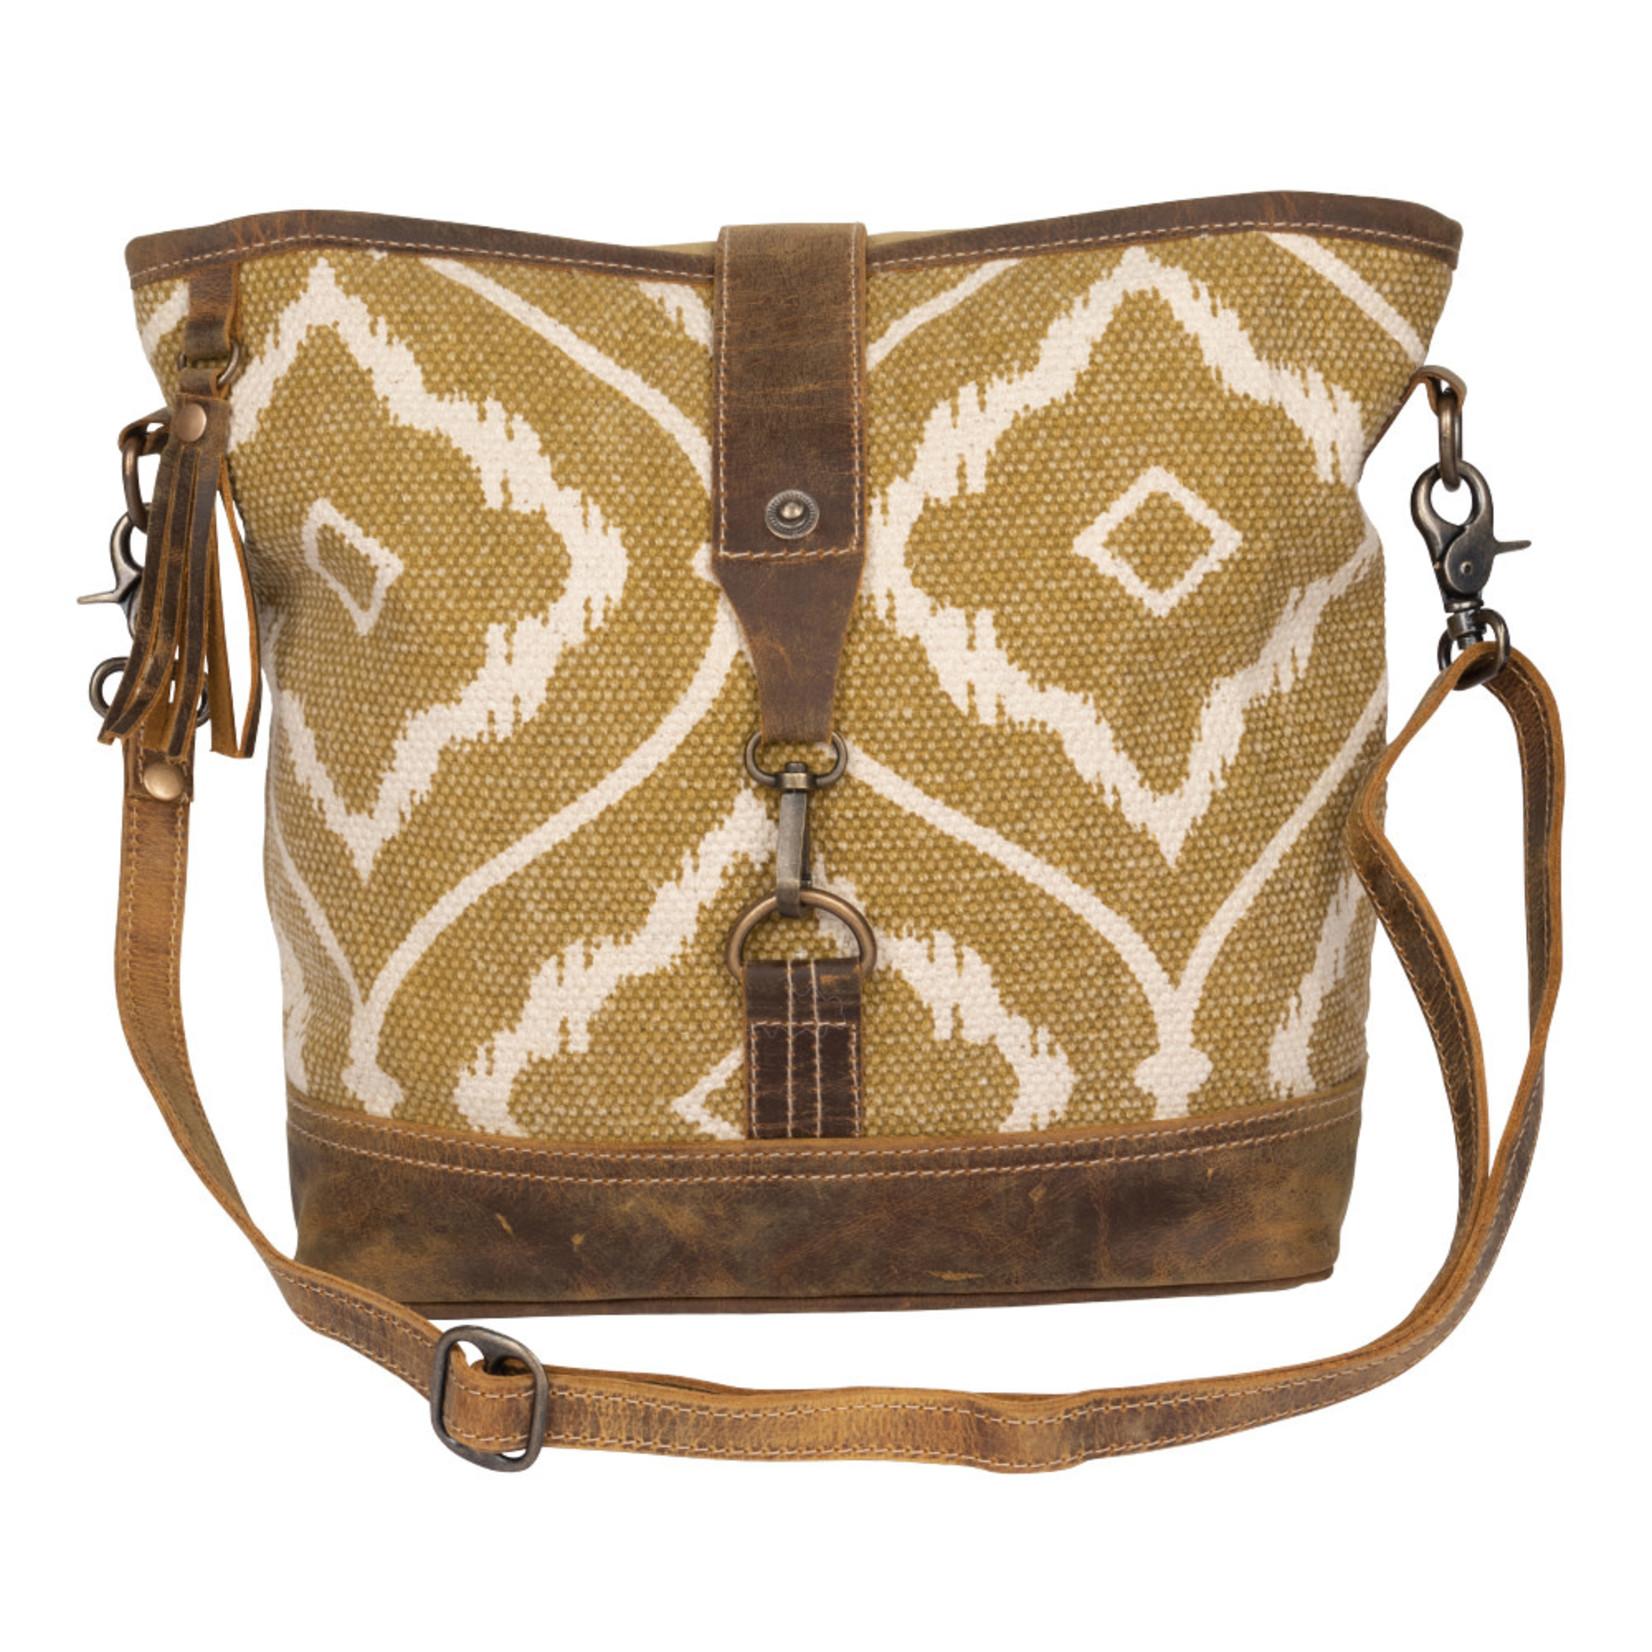 Myra Bags S-2228 Brown Aesthetics Shoulder Bag